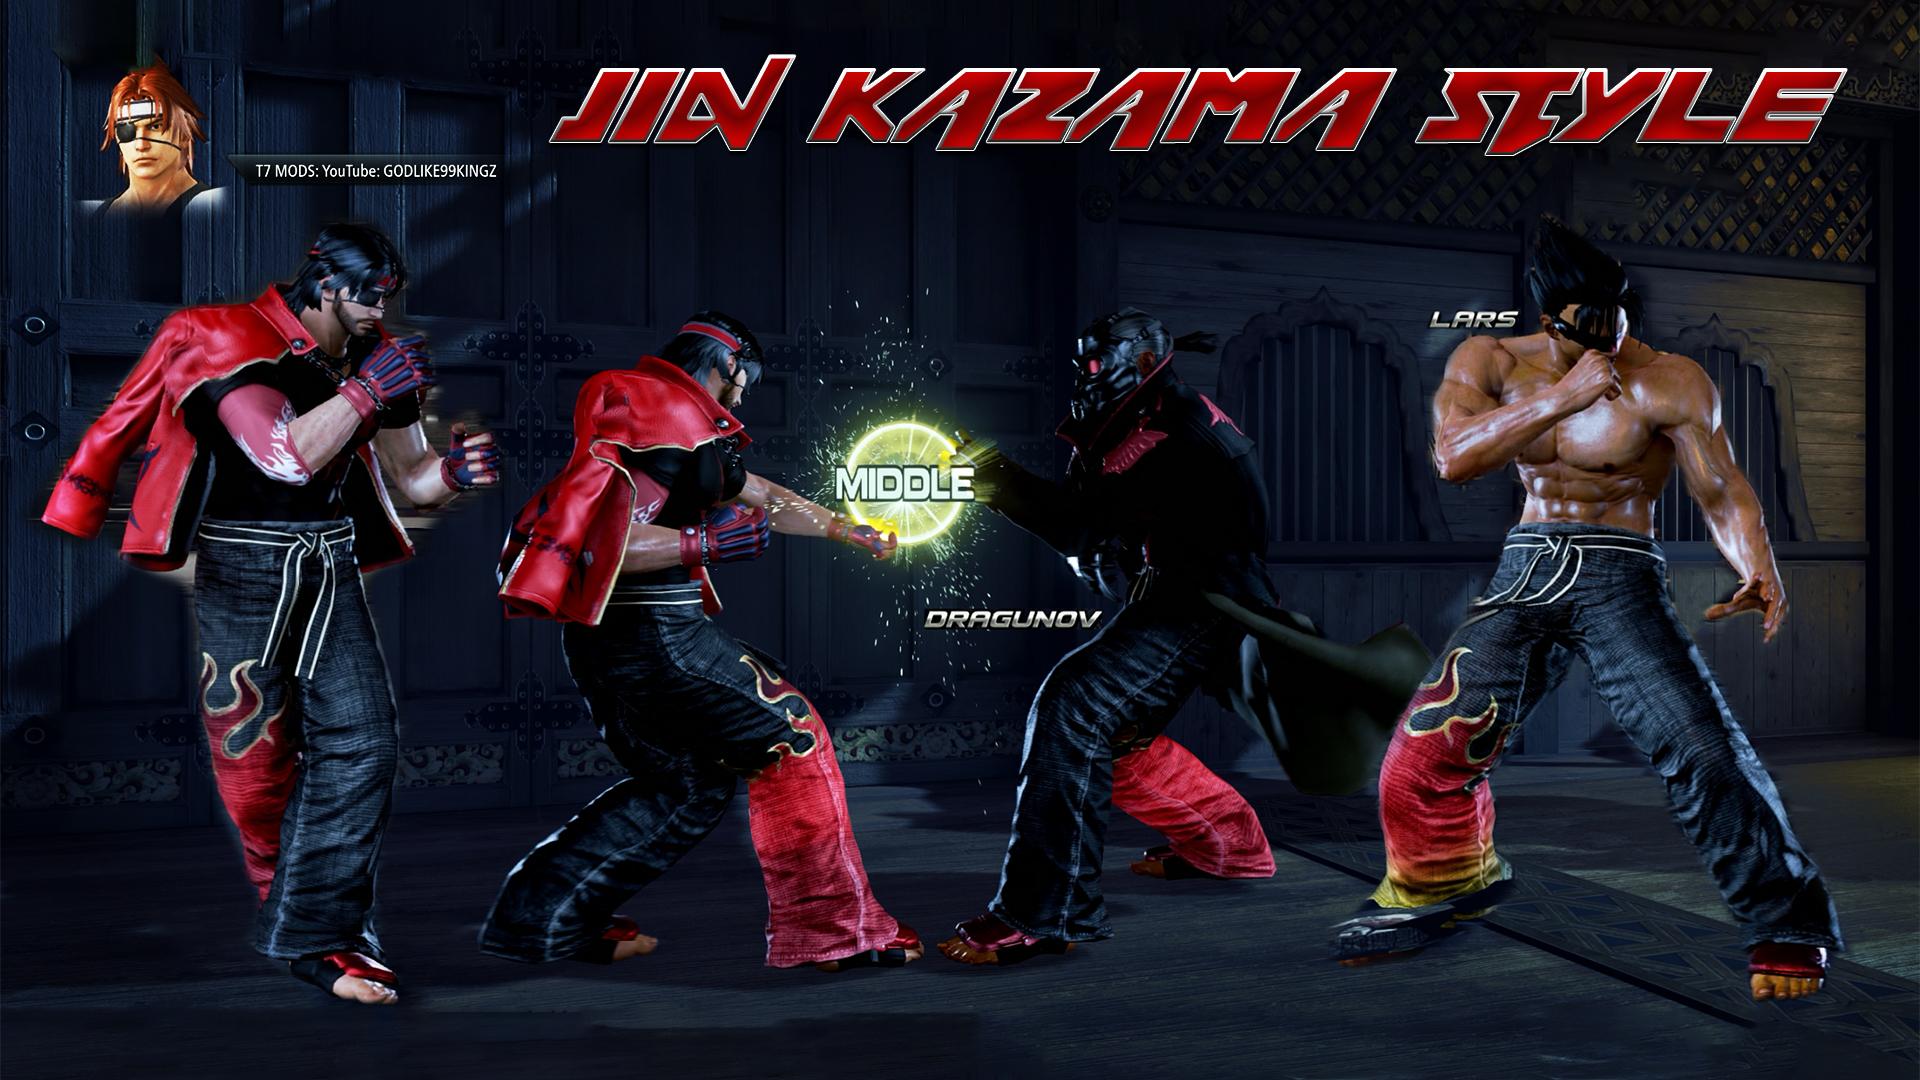 Tekken 7 Pc Character Jin Kazama Style Pack By Godlike99kingz On Deviantart